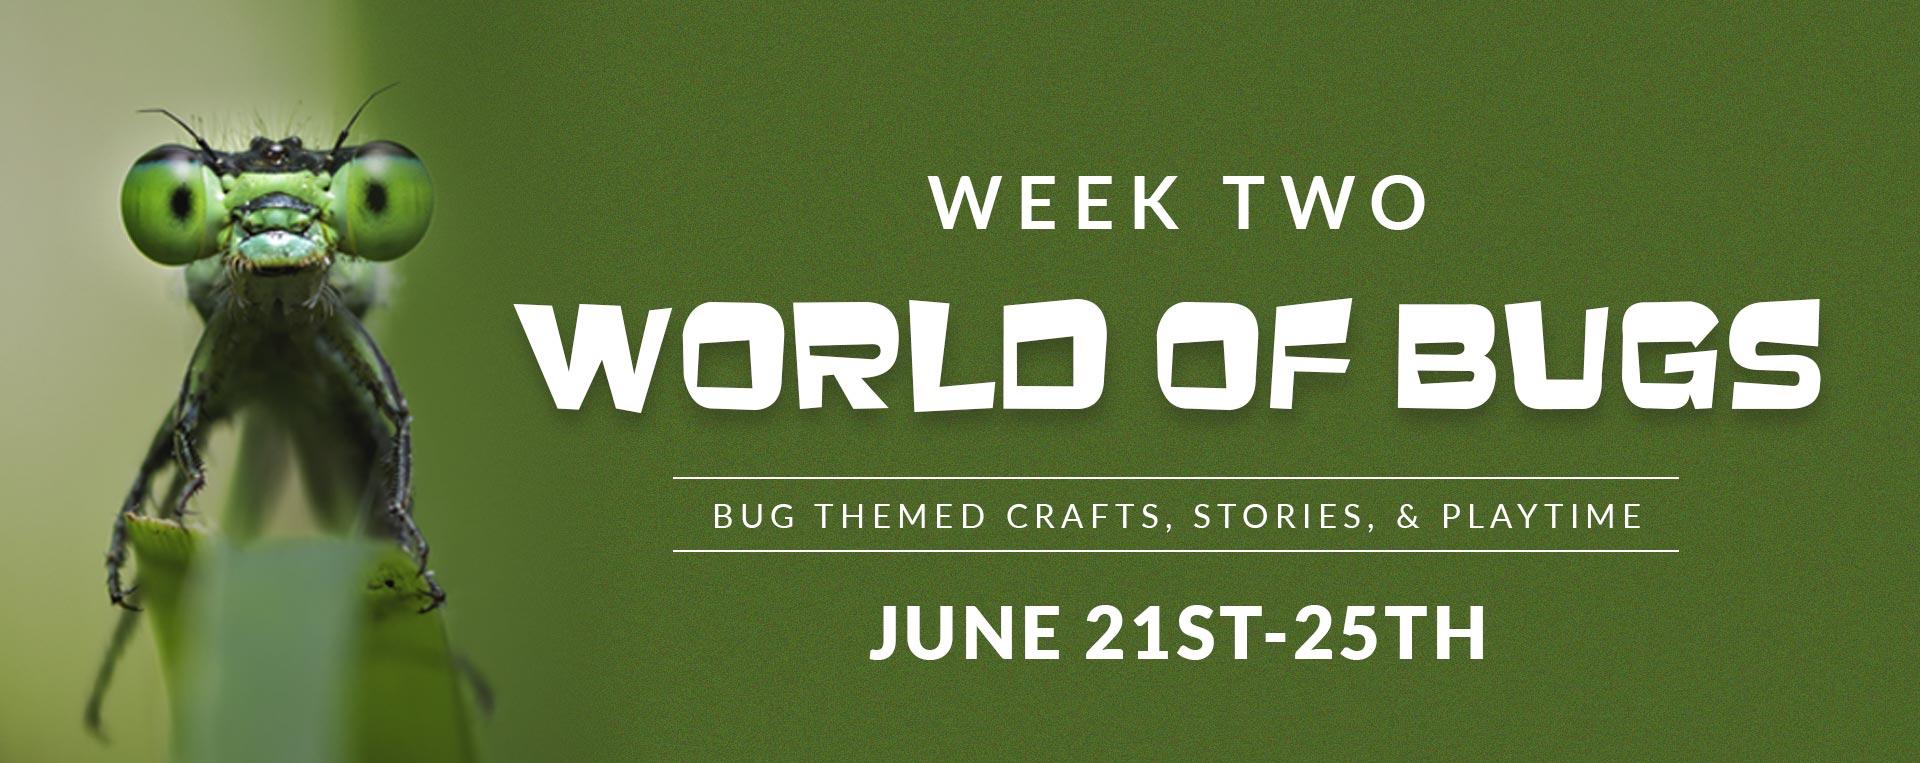 Preschool Camp - Week two - World of Bugs